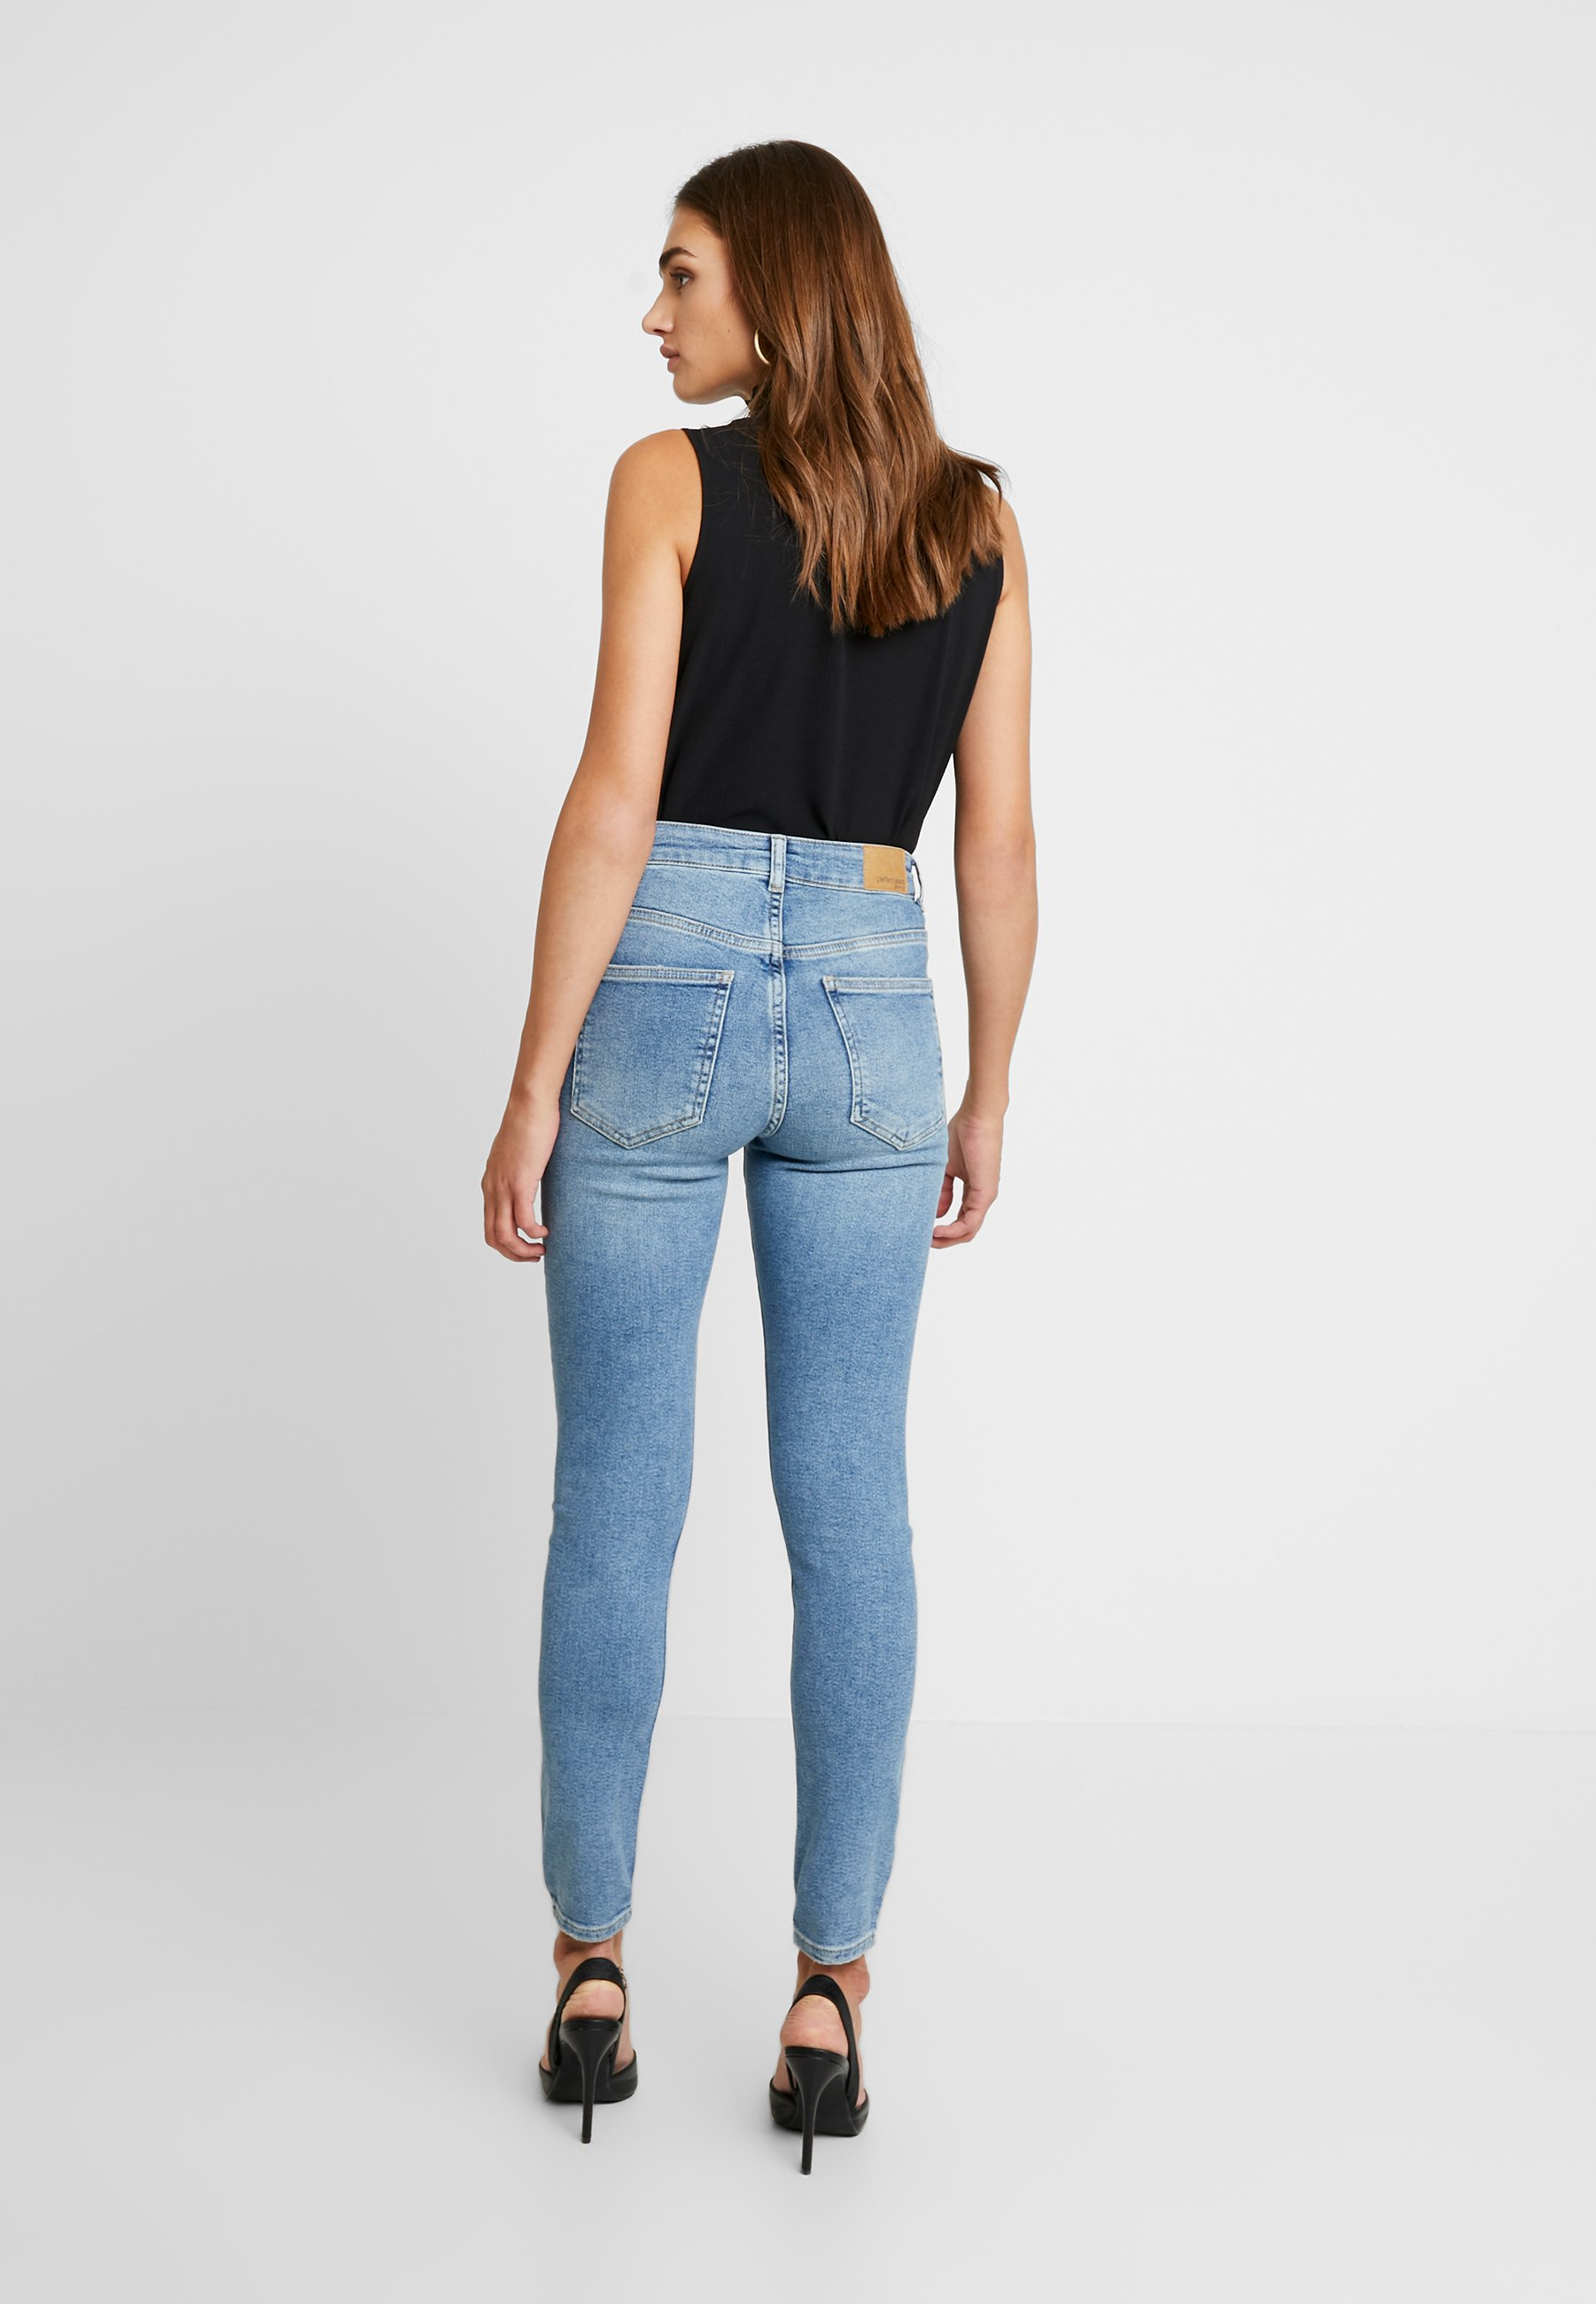 Gina Tricot HEDDA ORIGINAL - Jeans Skinny Fit mid blue